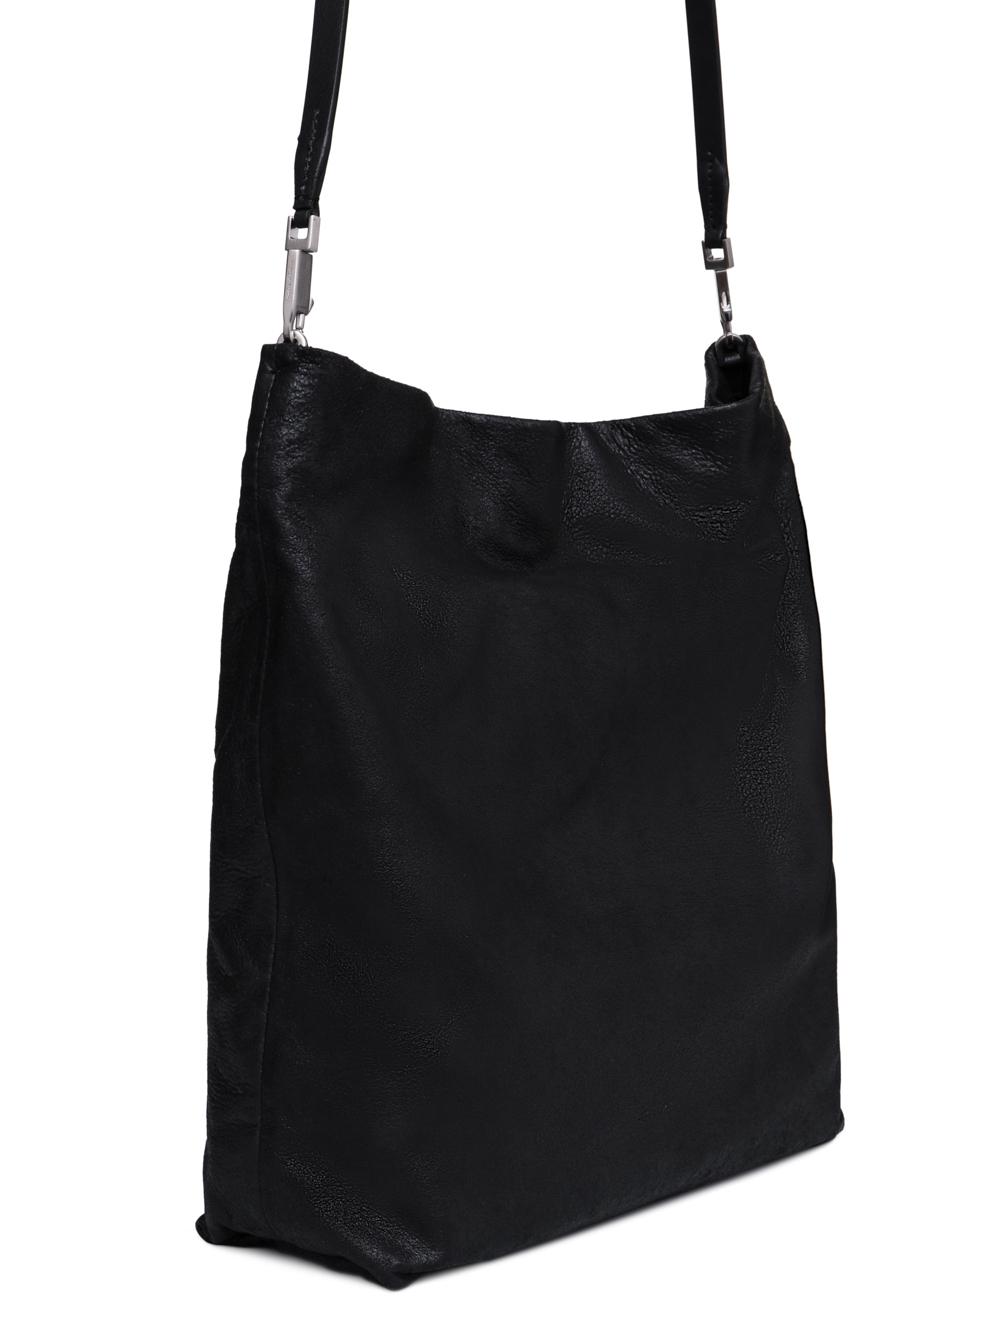 RICK OWENS FW18 SISYPHUS BIG ADRI BAG IN BLACK OILY BLISTER LAMB LEATHER